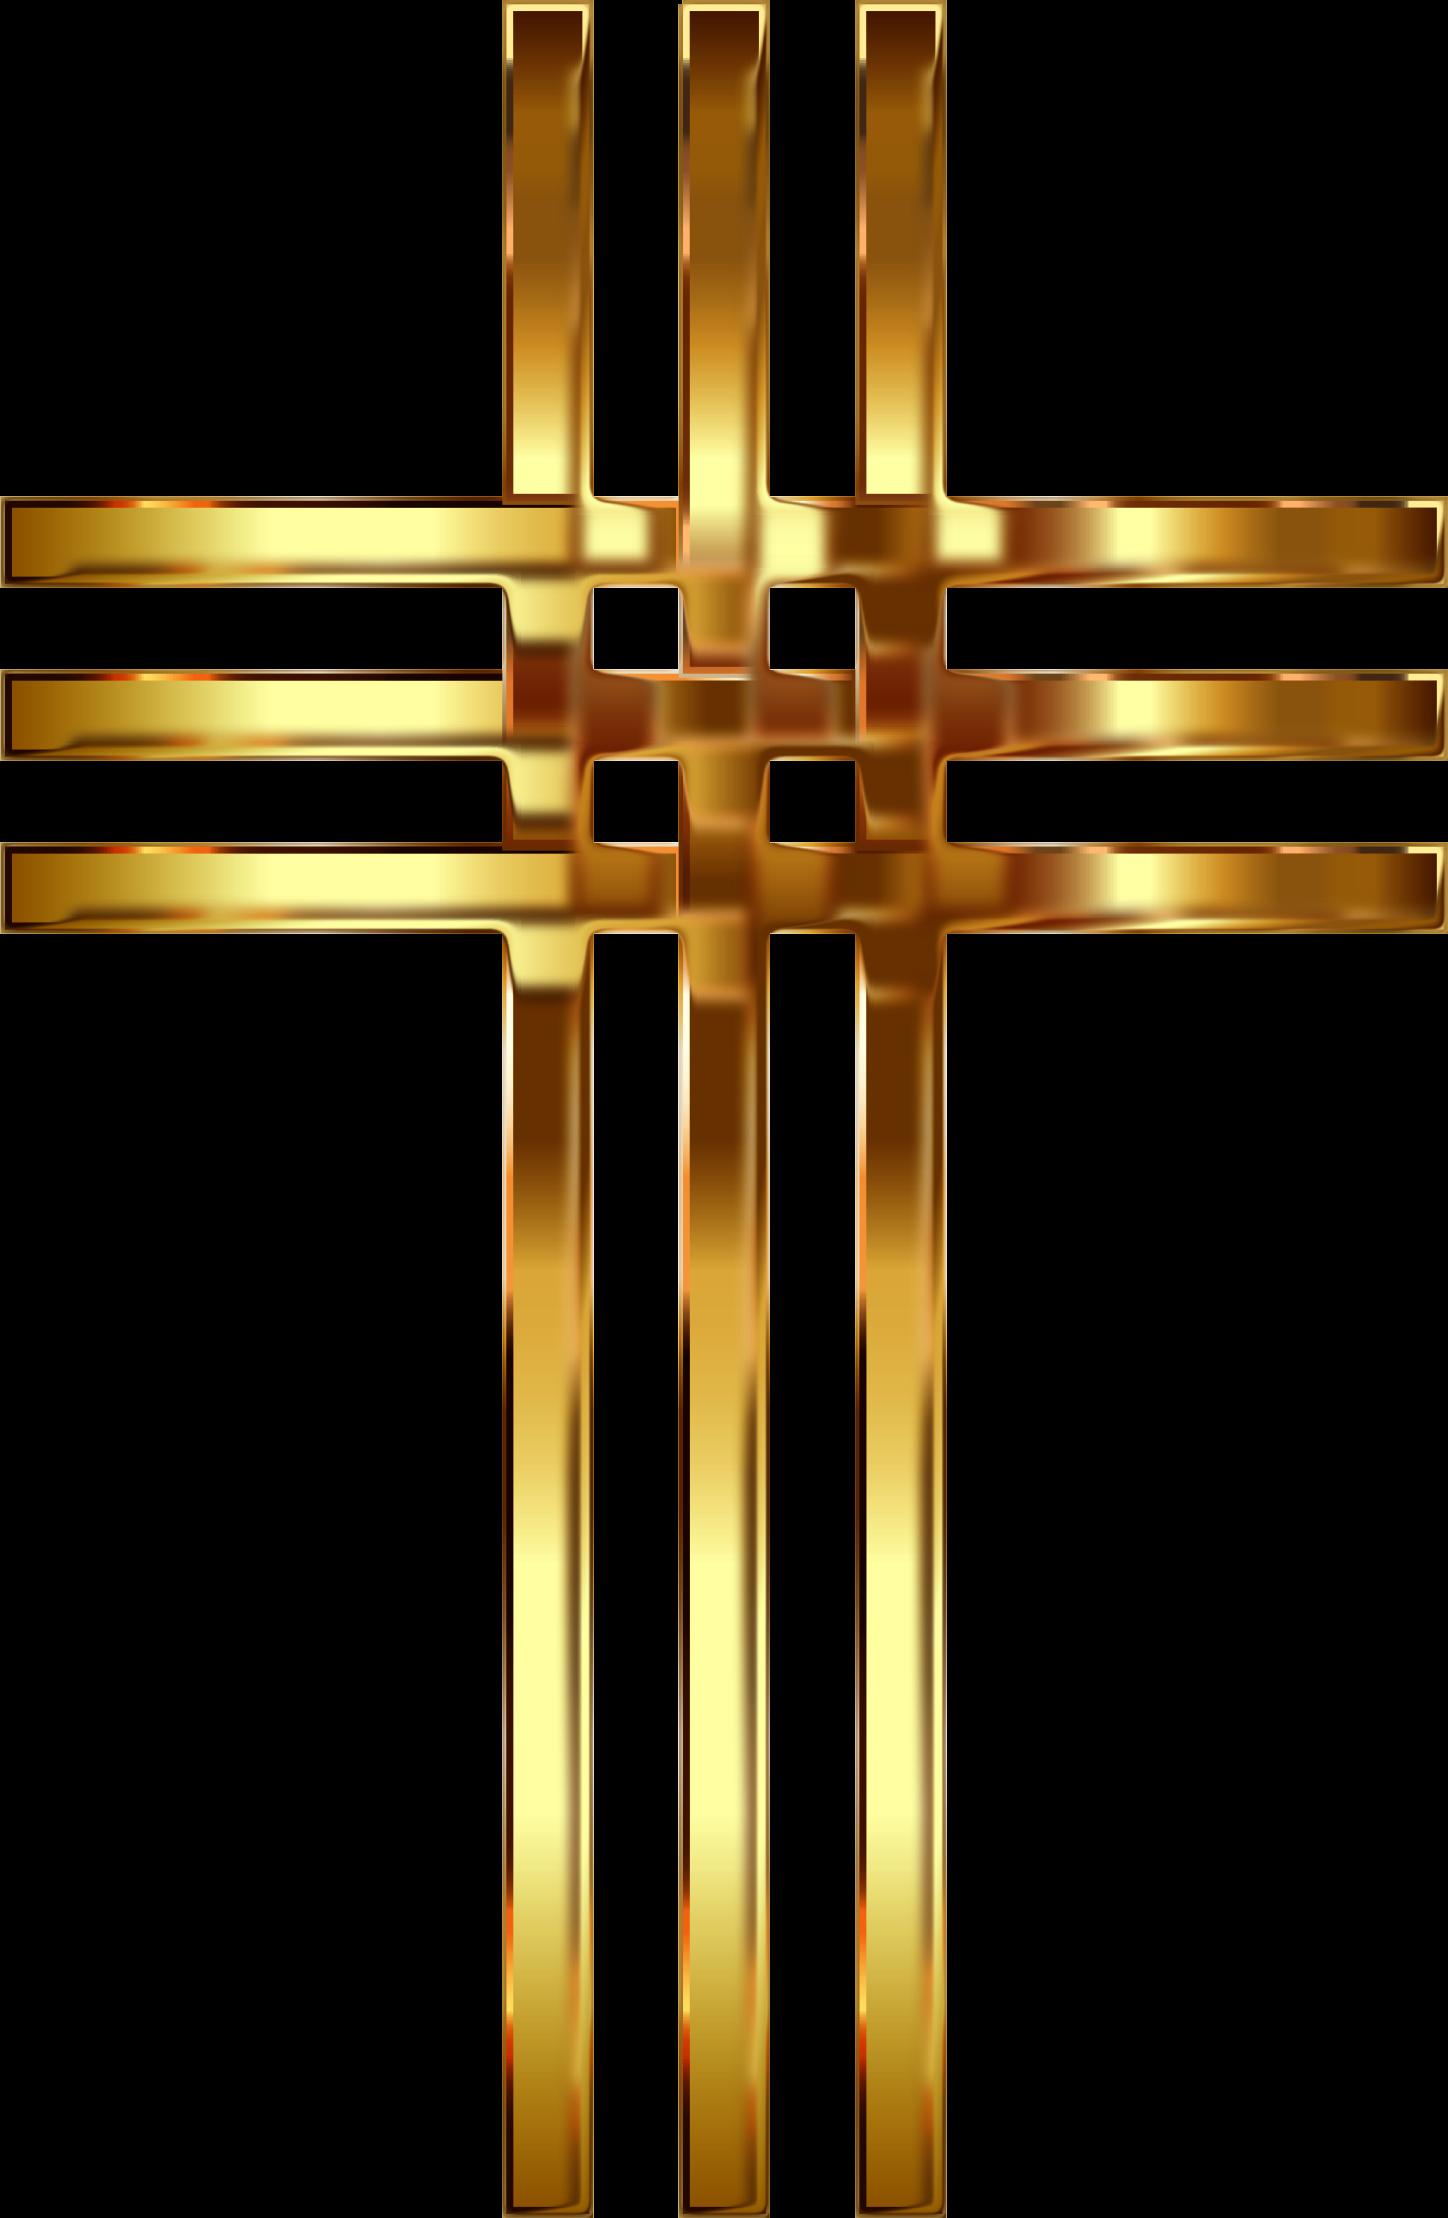 Clipart - Interlocked Stylized Golden Cross Enhanced 2 No Background clip art free stock